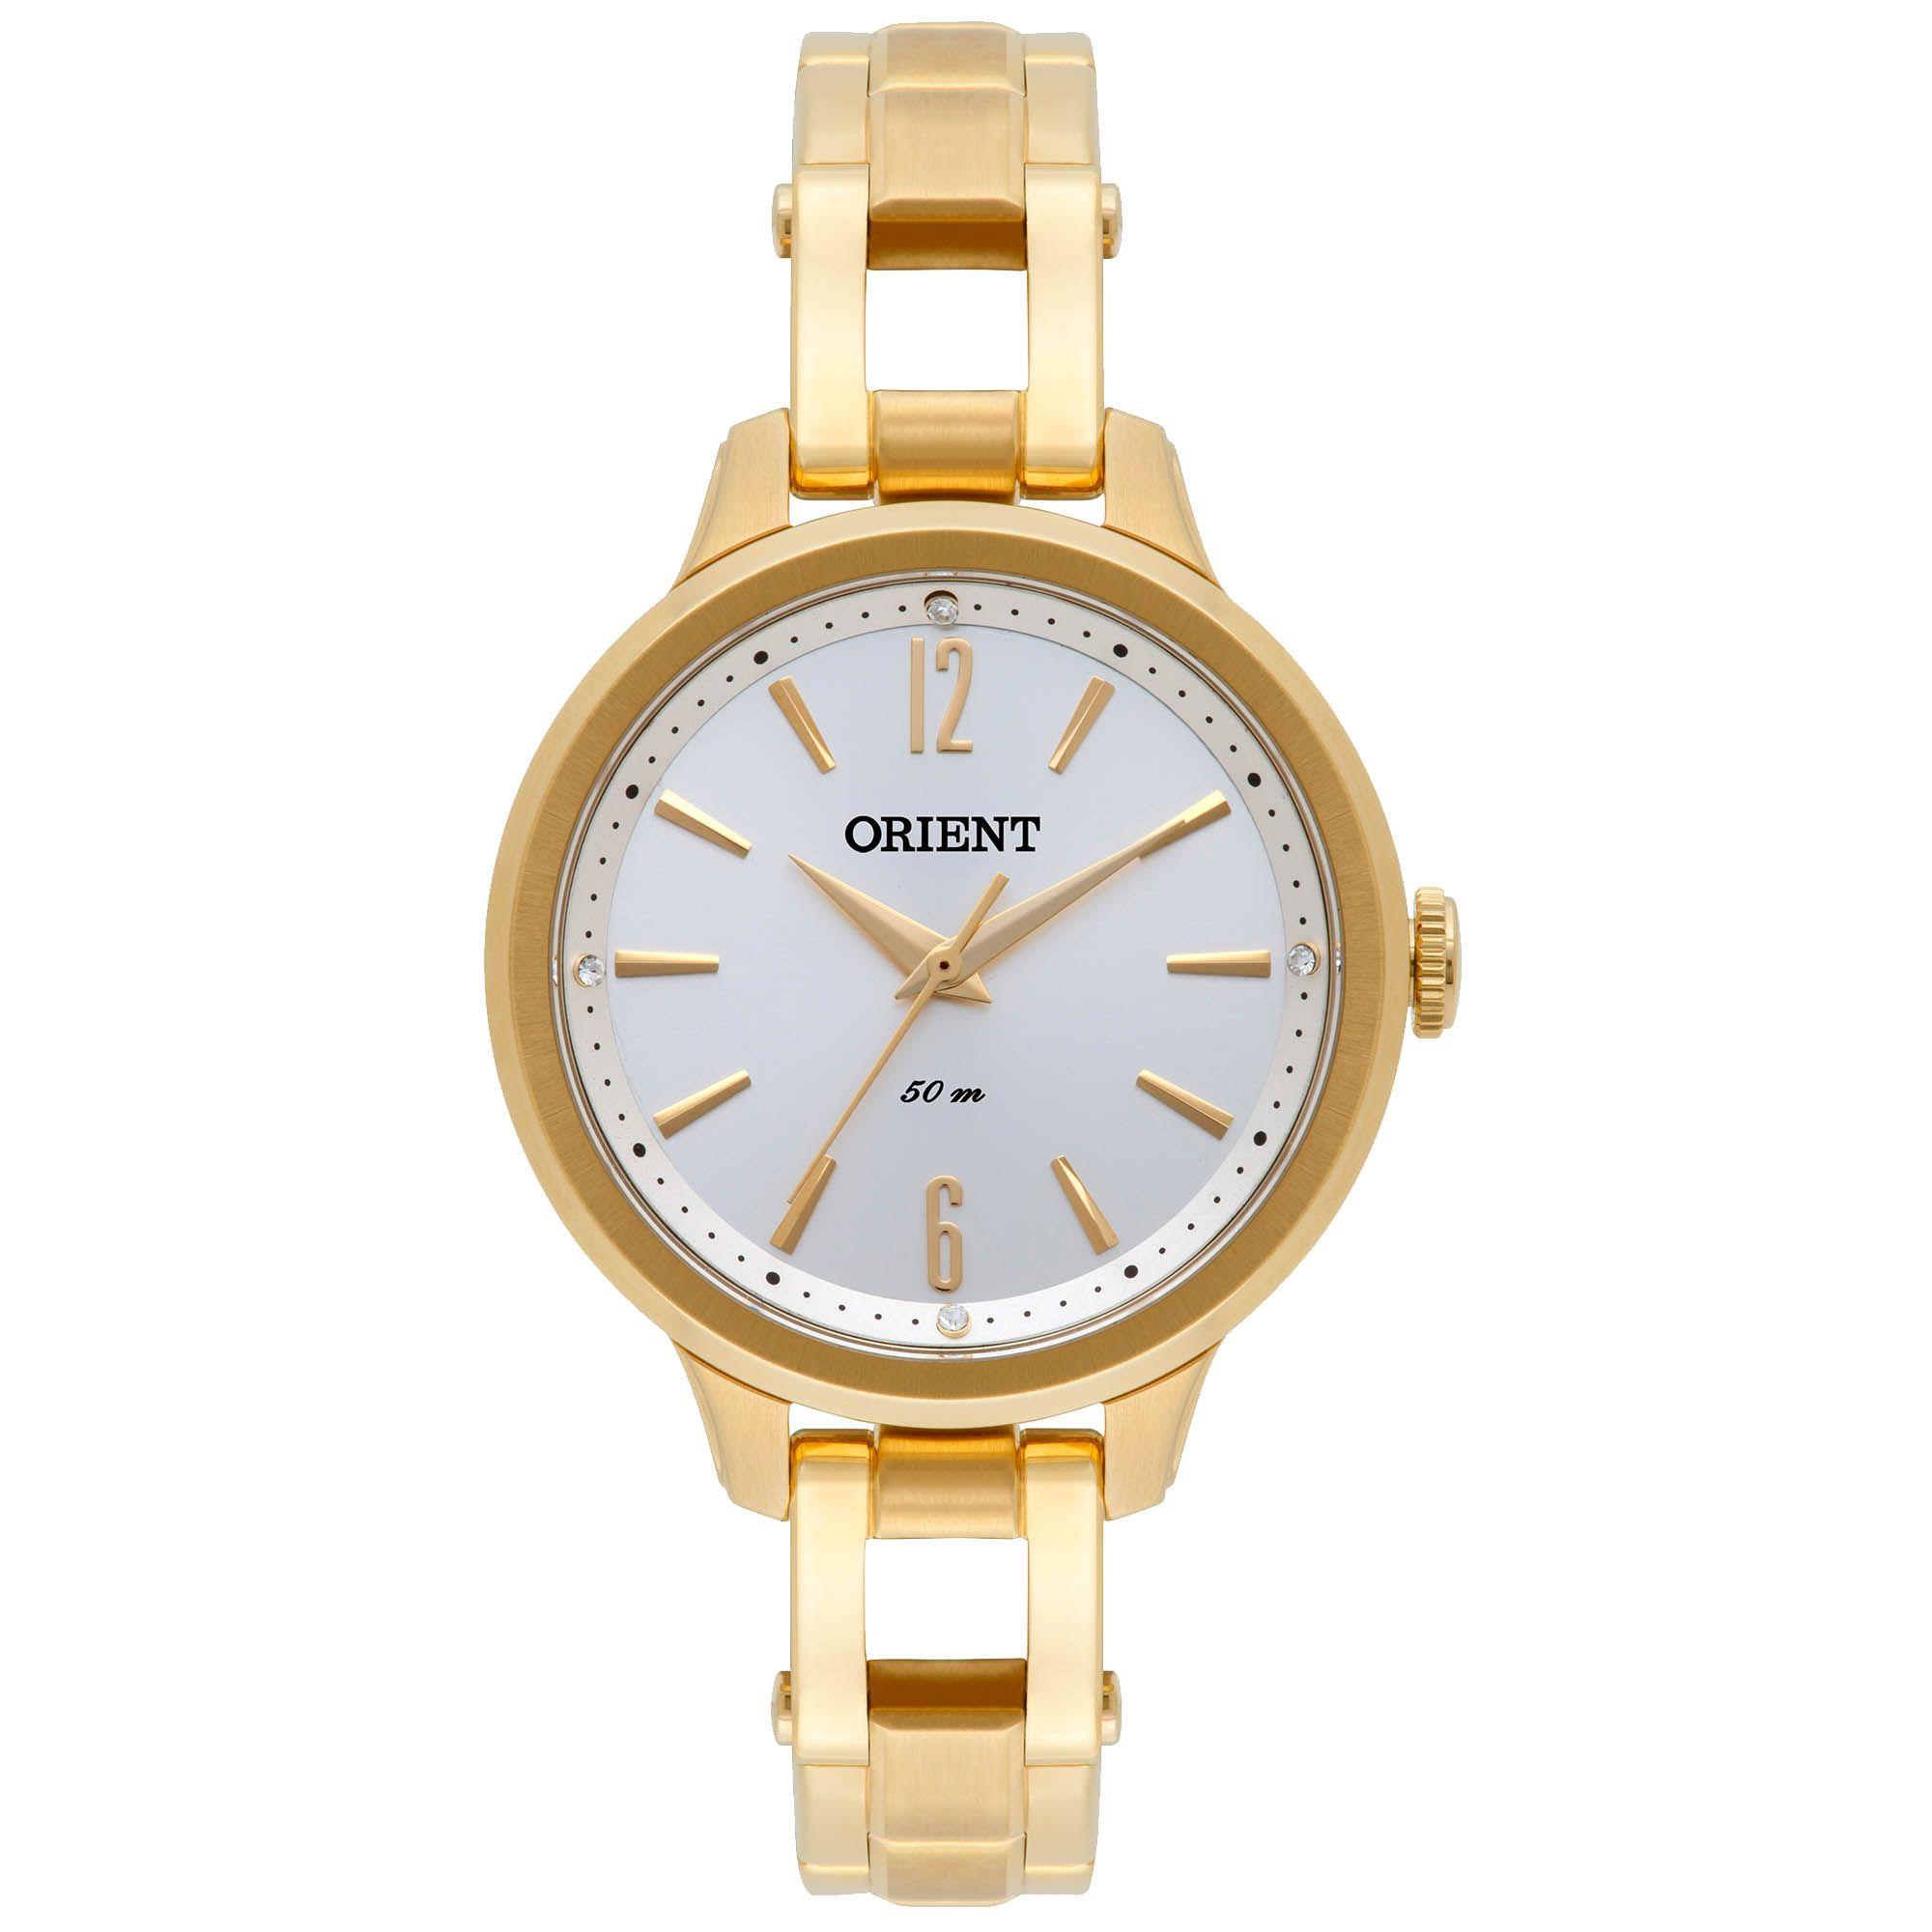 Relógio Feminino Orient FGSS0065 S2KX